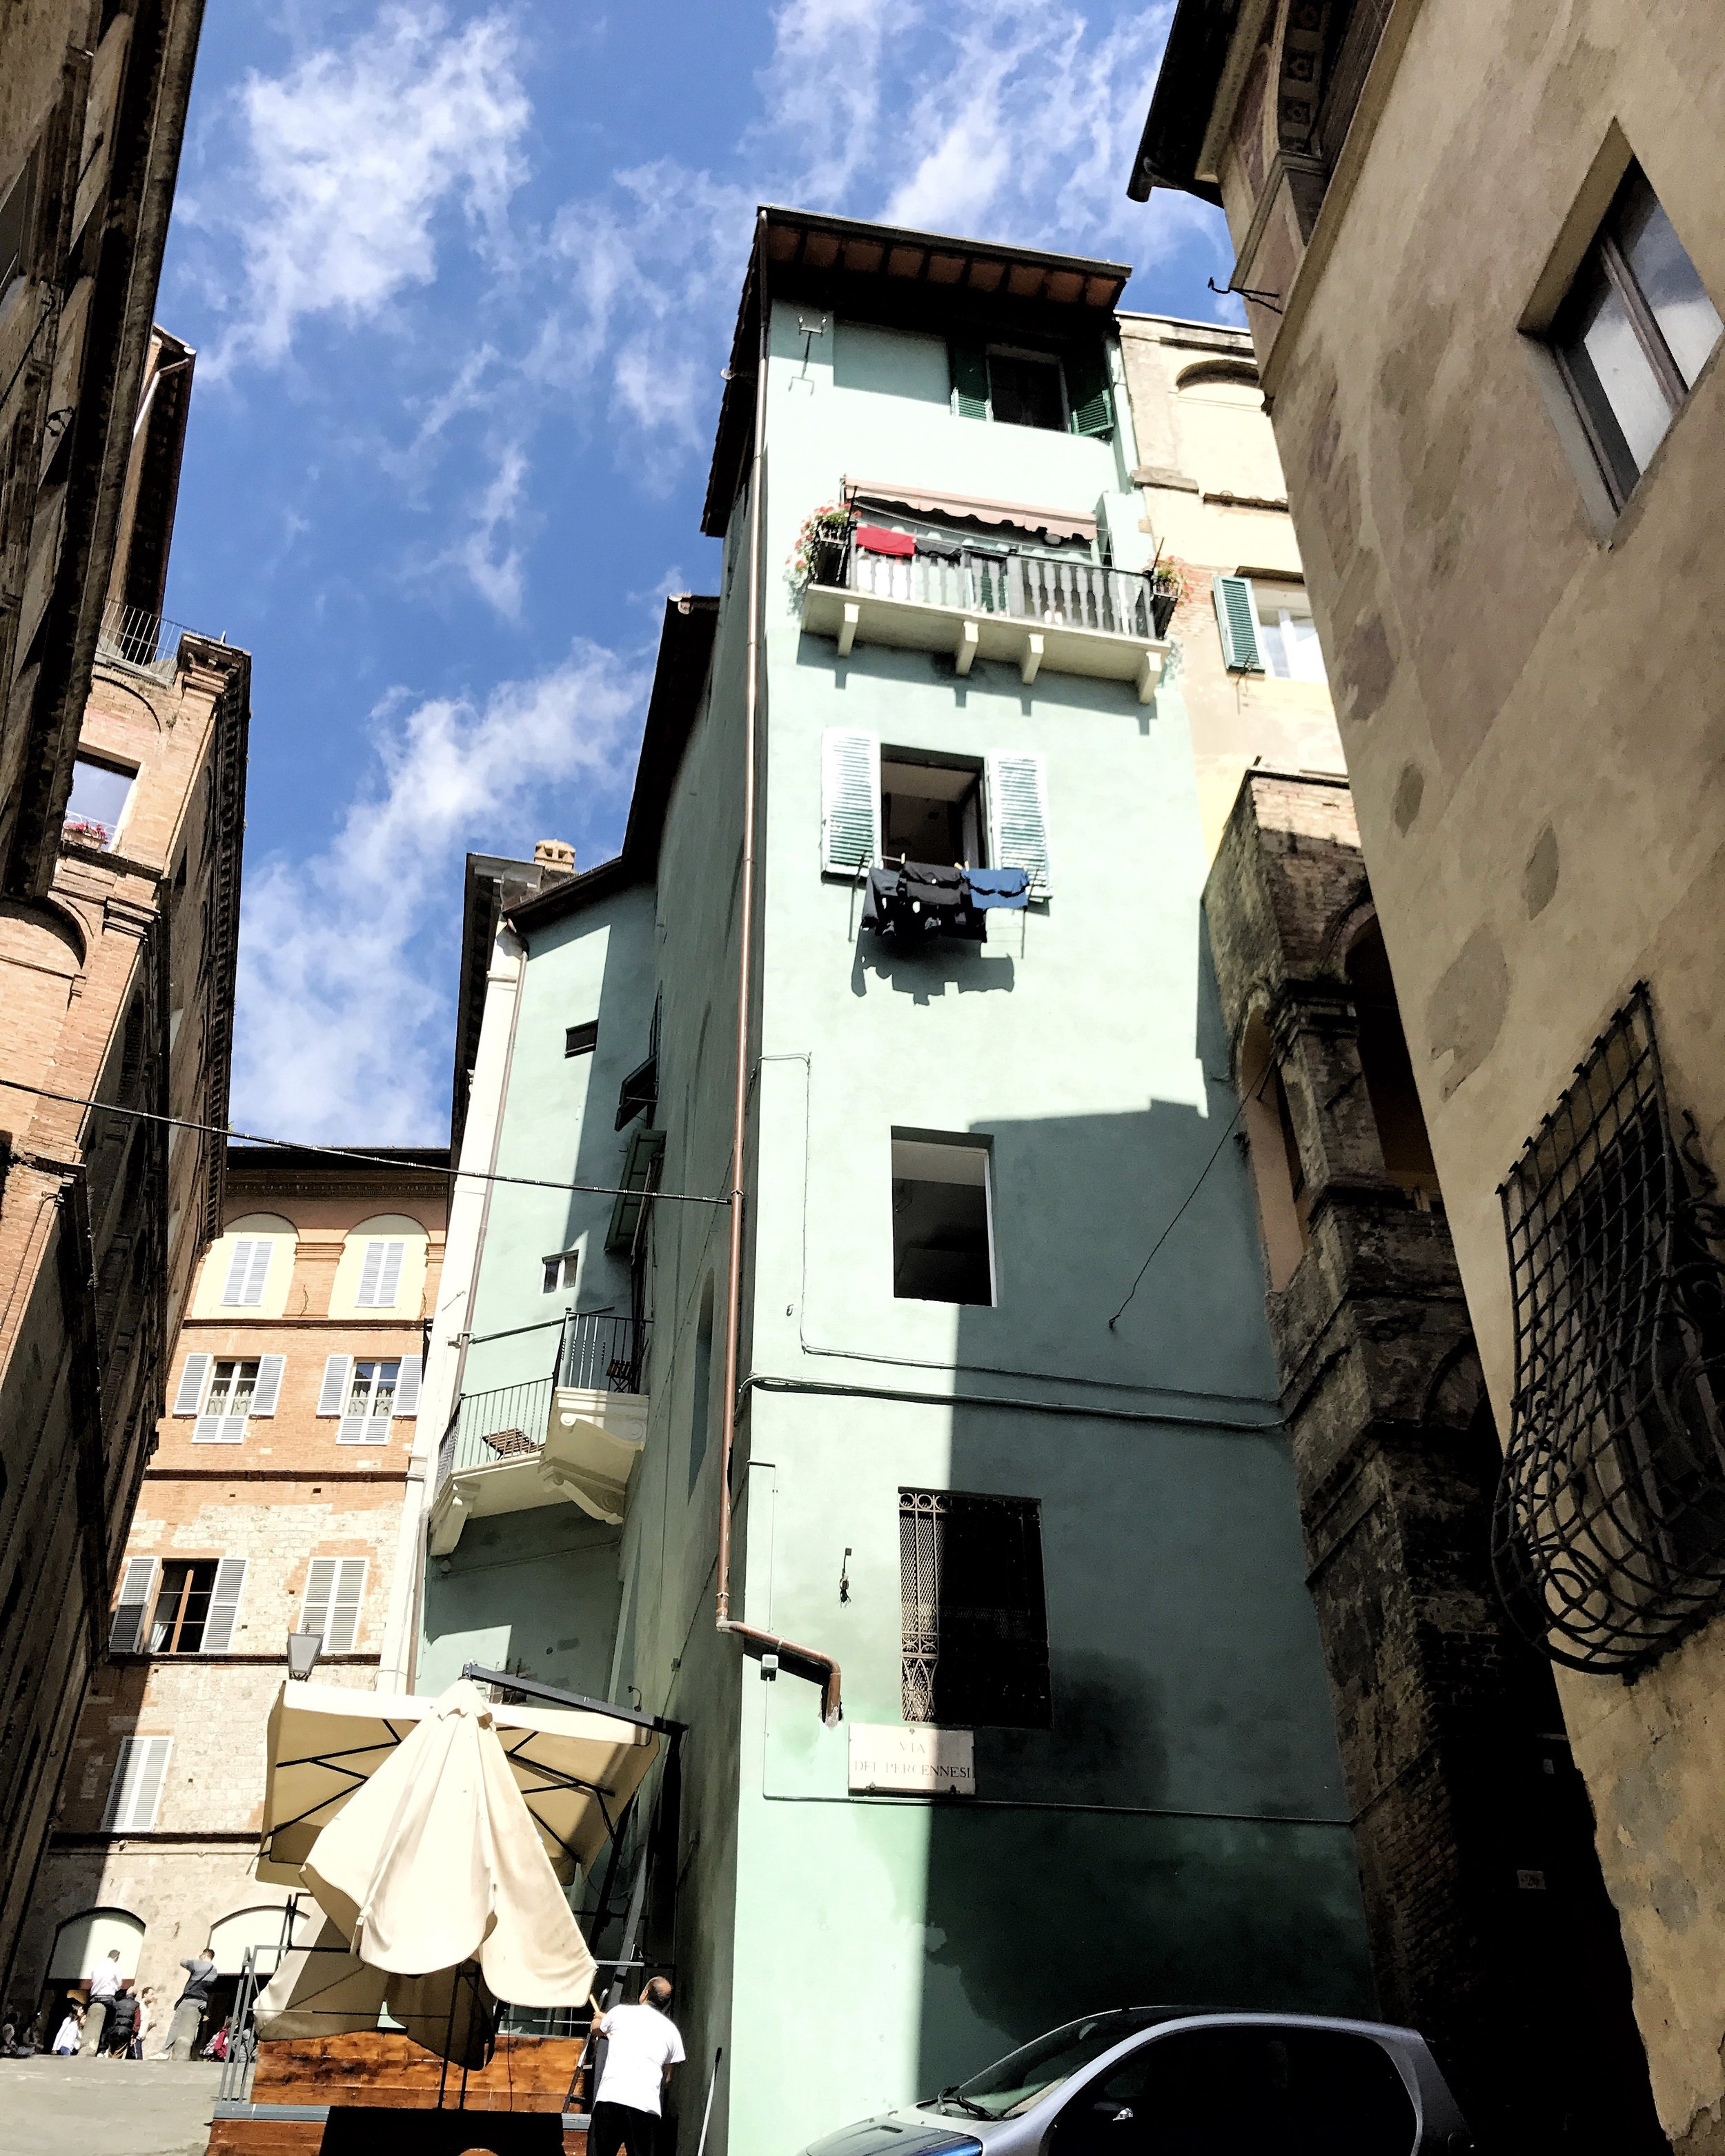 Street views of Siena, Italy